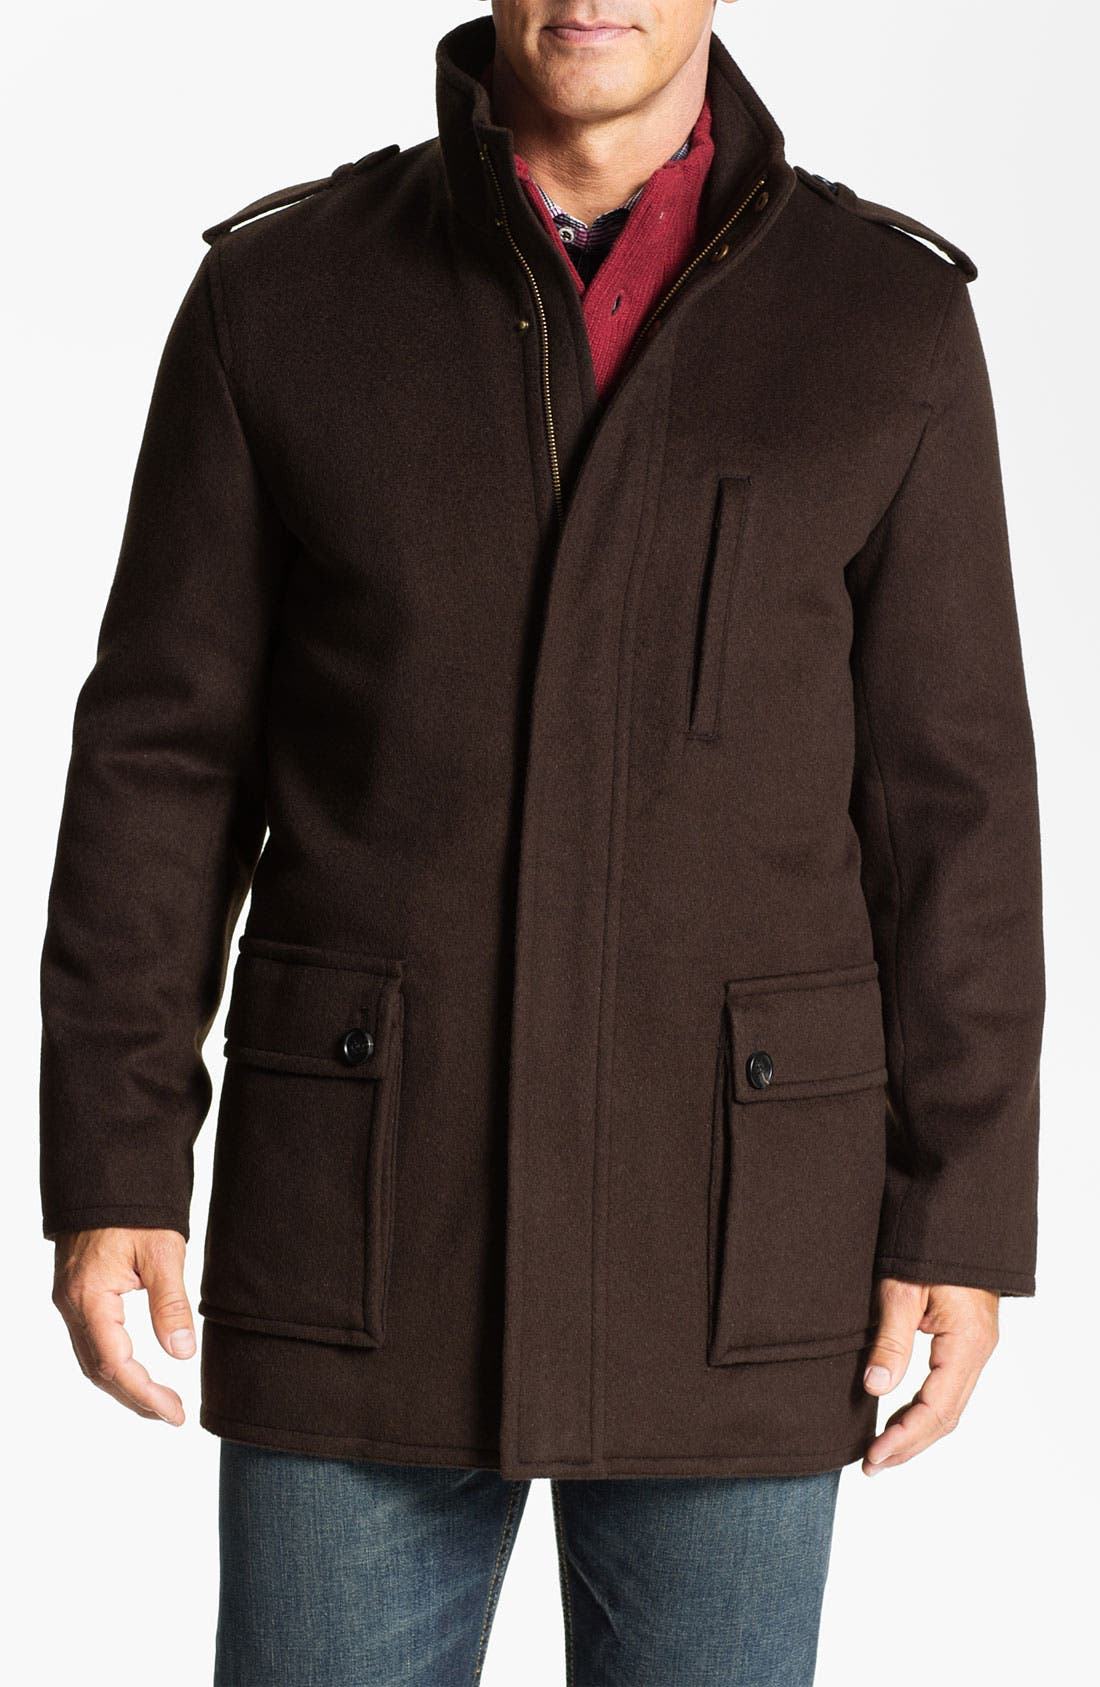 Alternate Image 1 Selected - Hart Schaffner Marx Wool & Cashmere Jacket